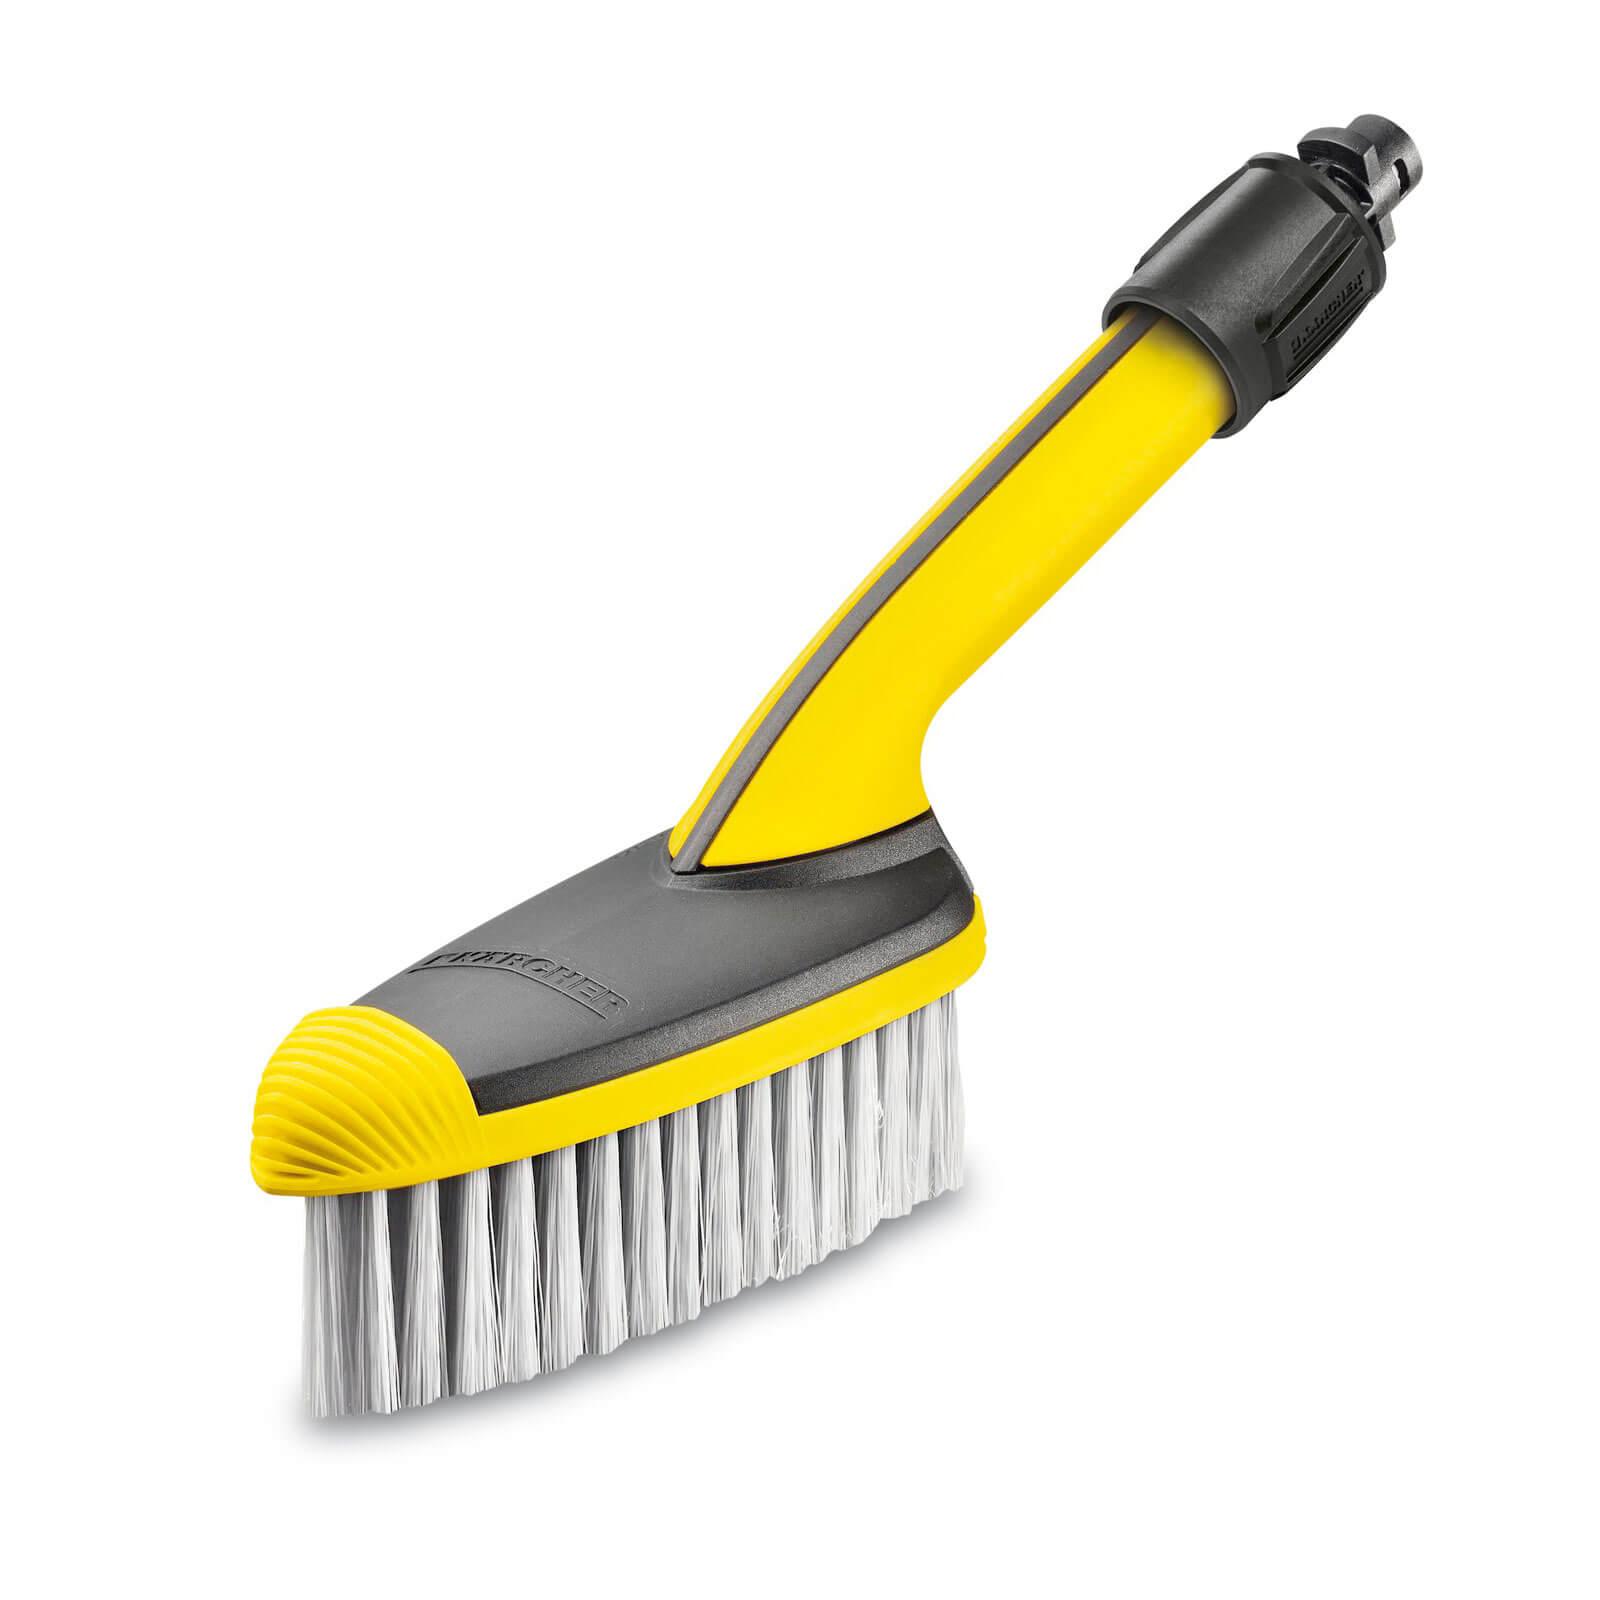 buy cheap karcher k2 compare garden tools prices for best uk deals. Black Bedroom Furniture Sets. Home Design Ideas